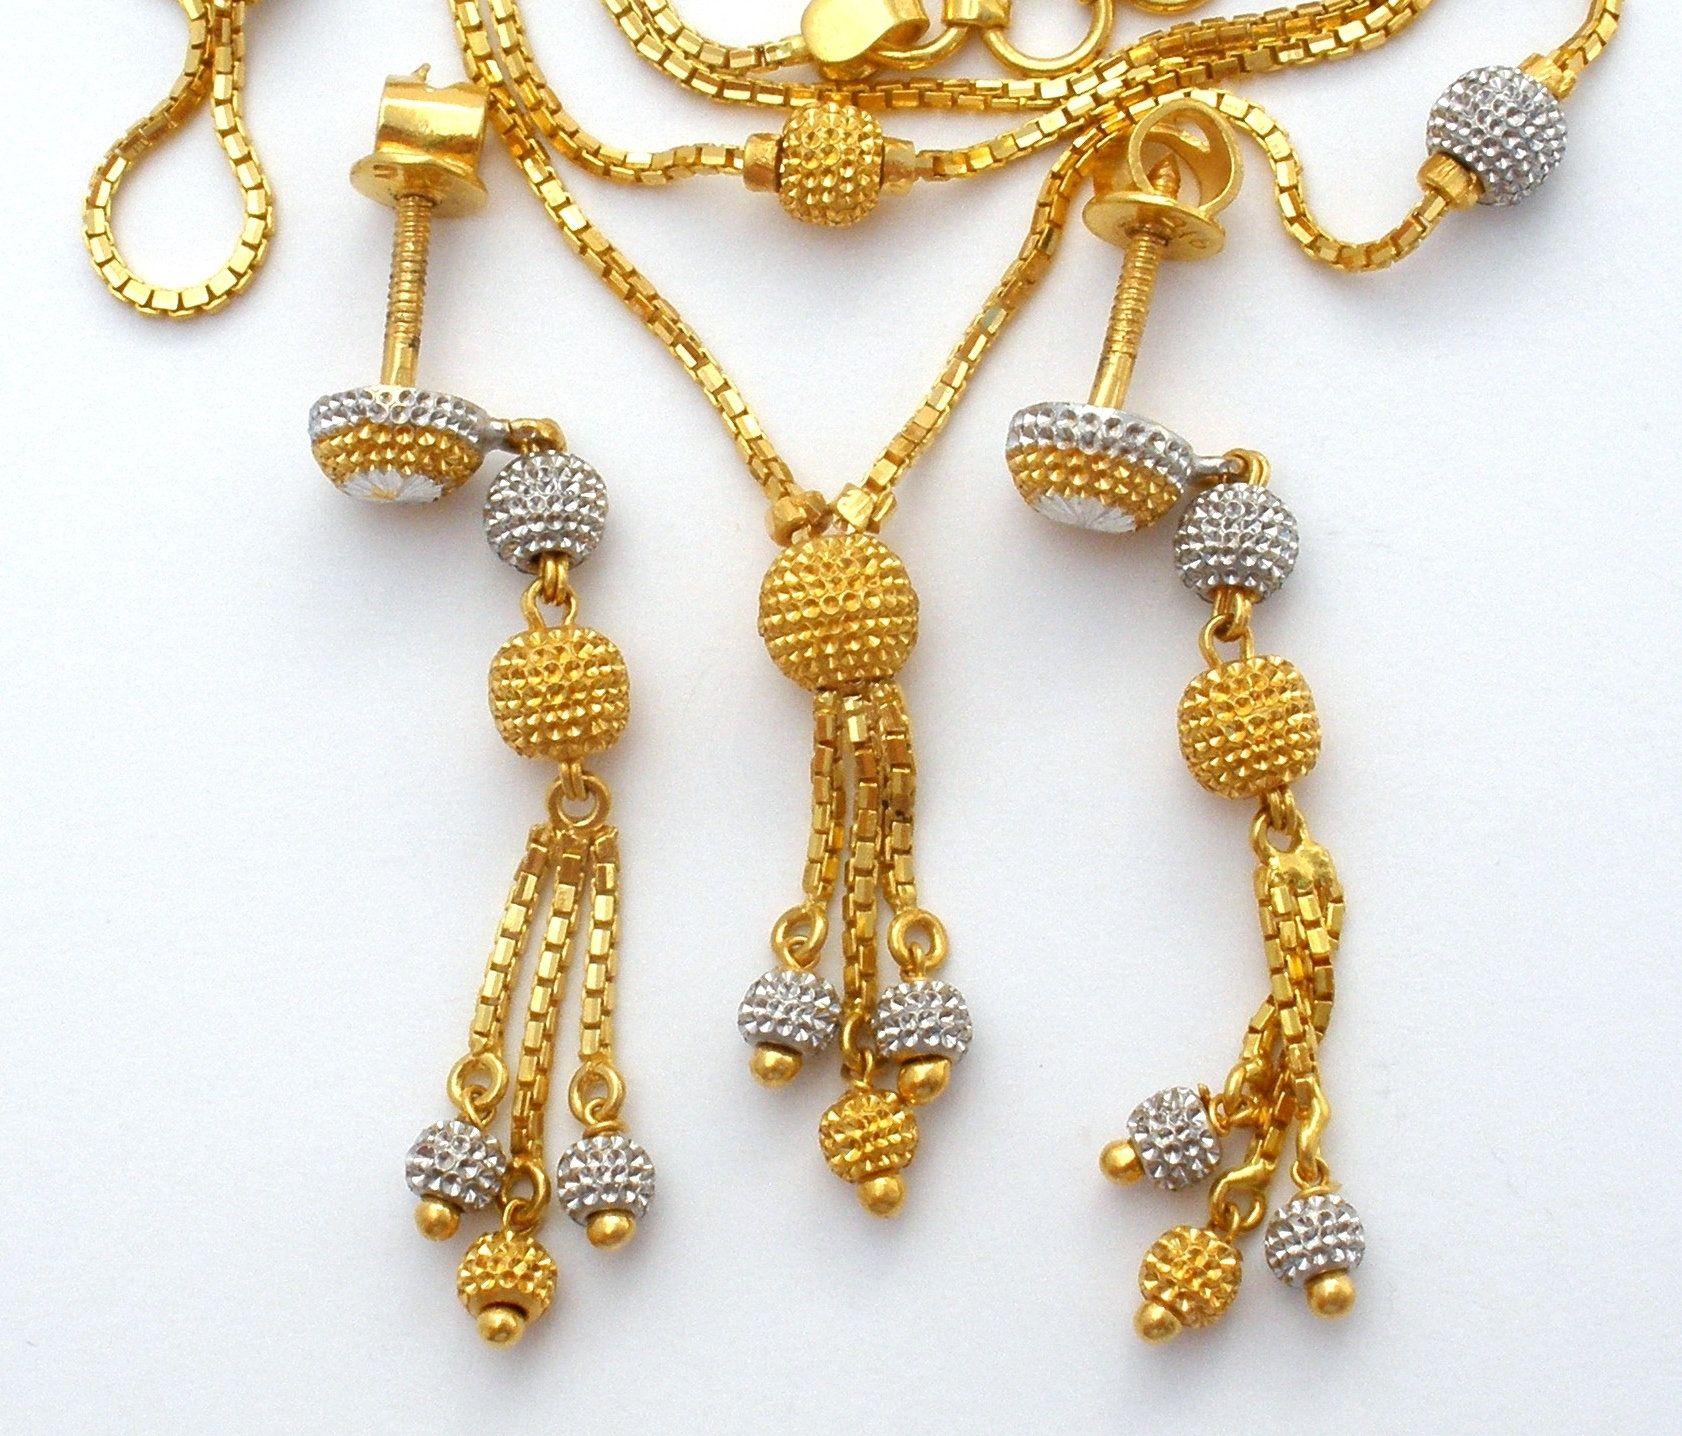 White Gold Necklace And Bracelet Set